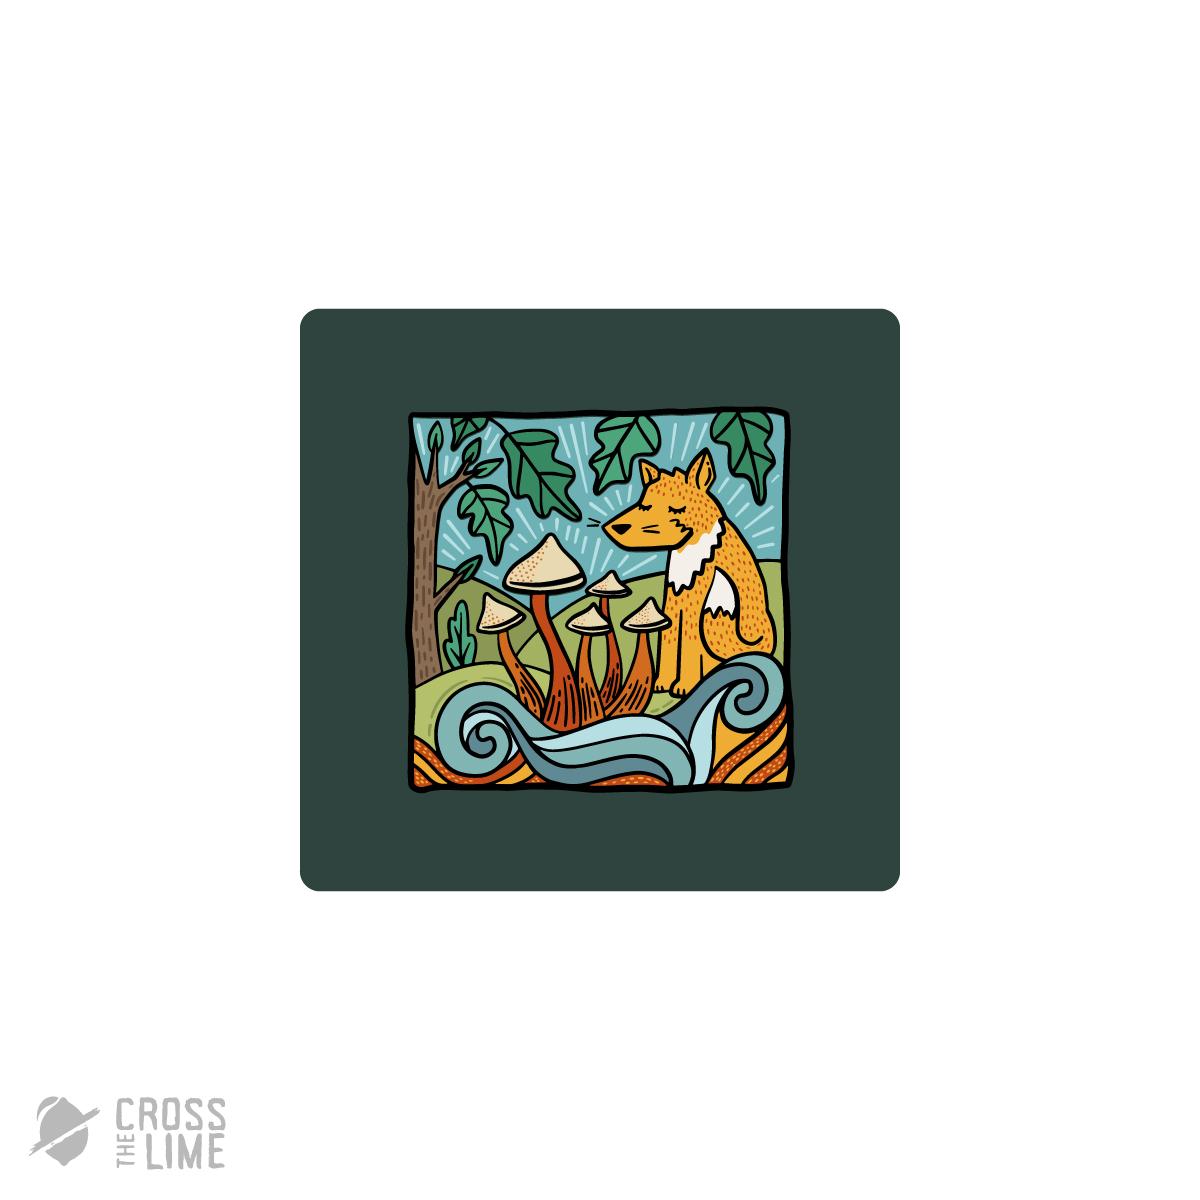 Mosaic Jungle logo